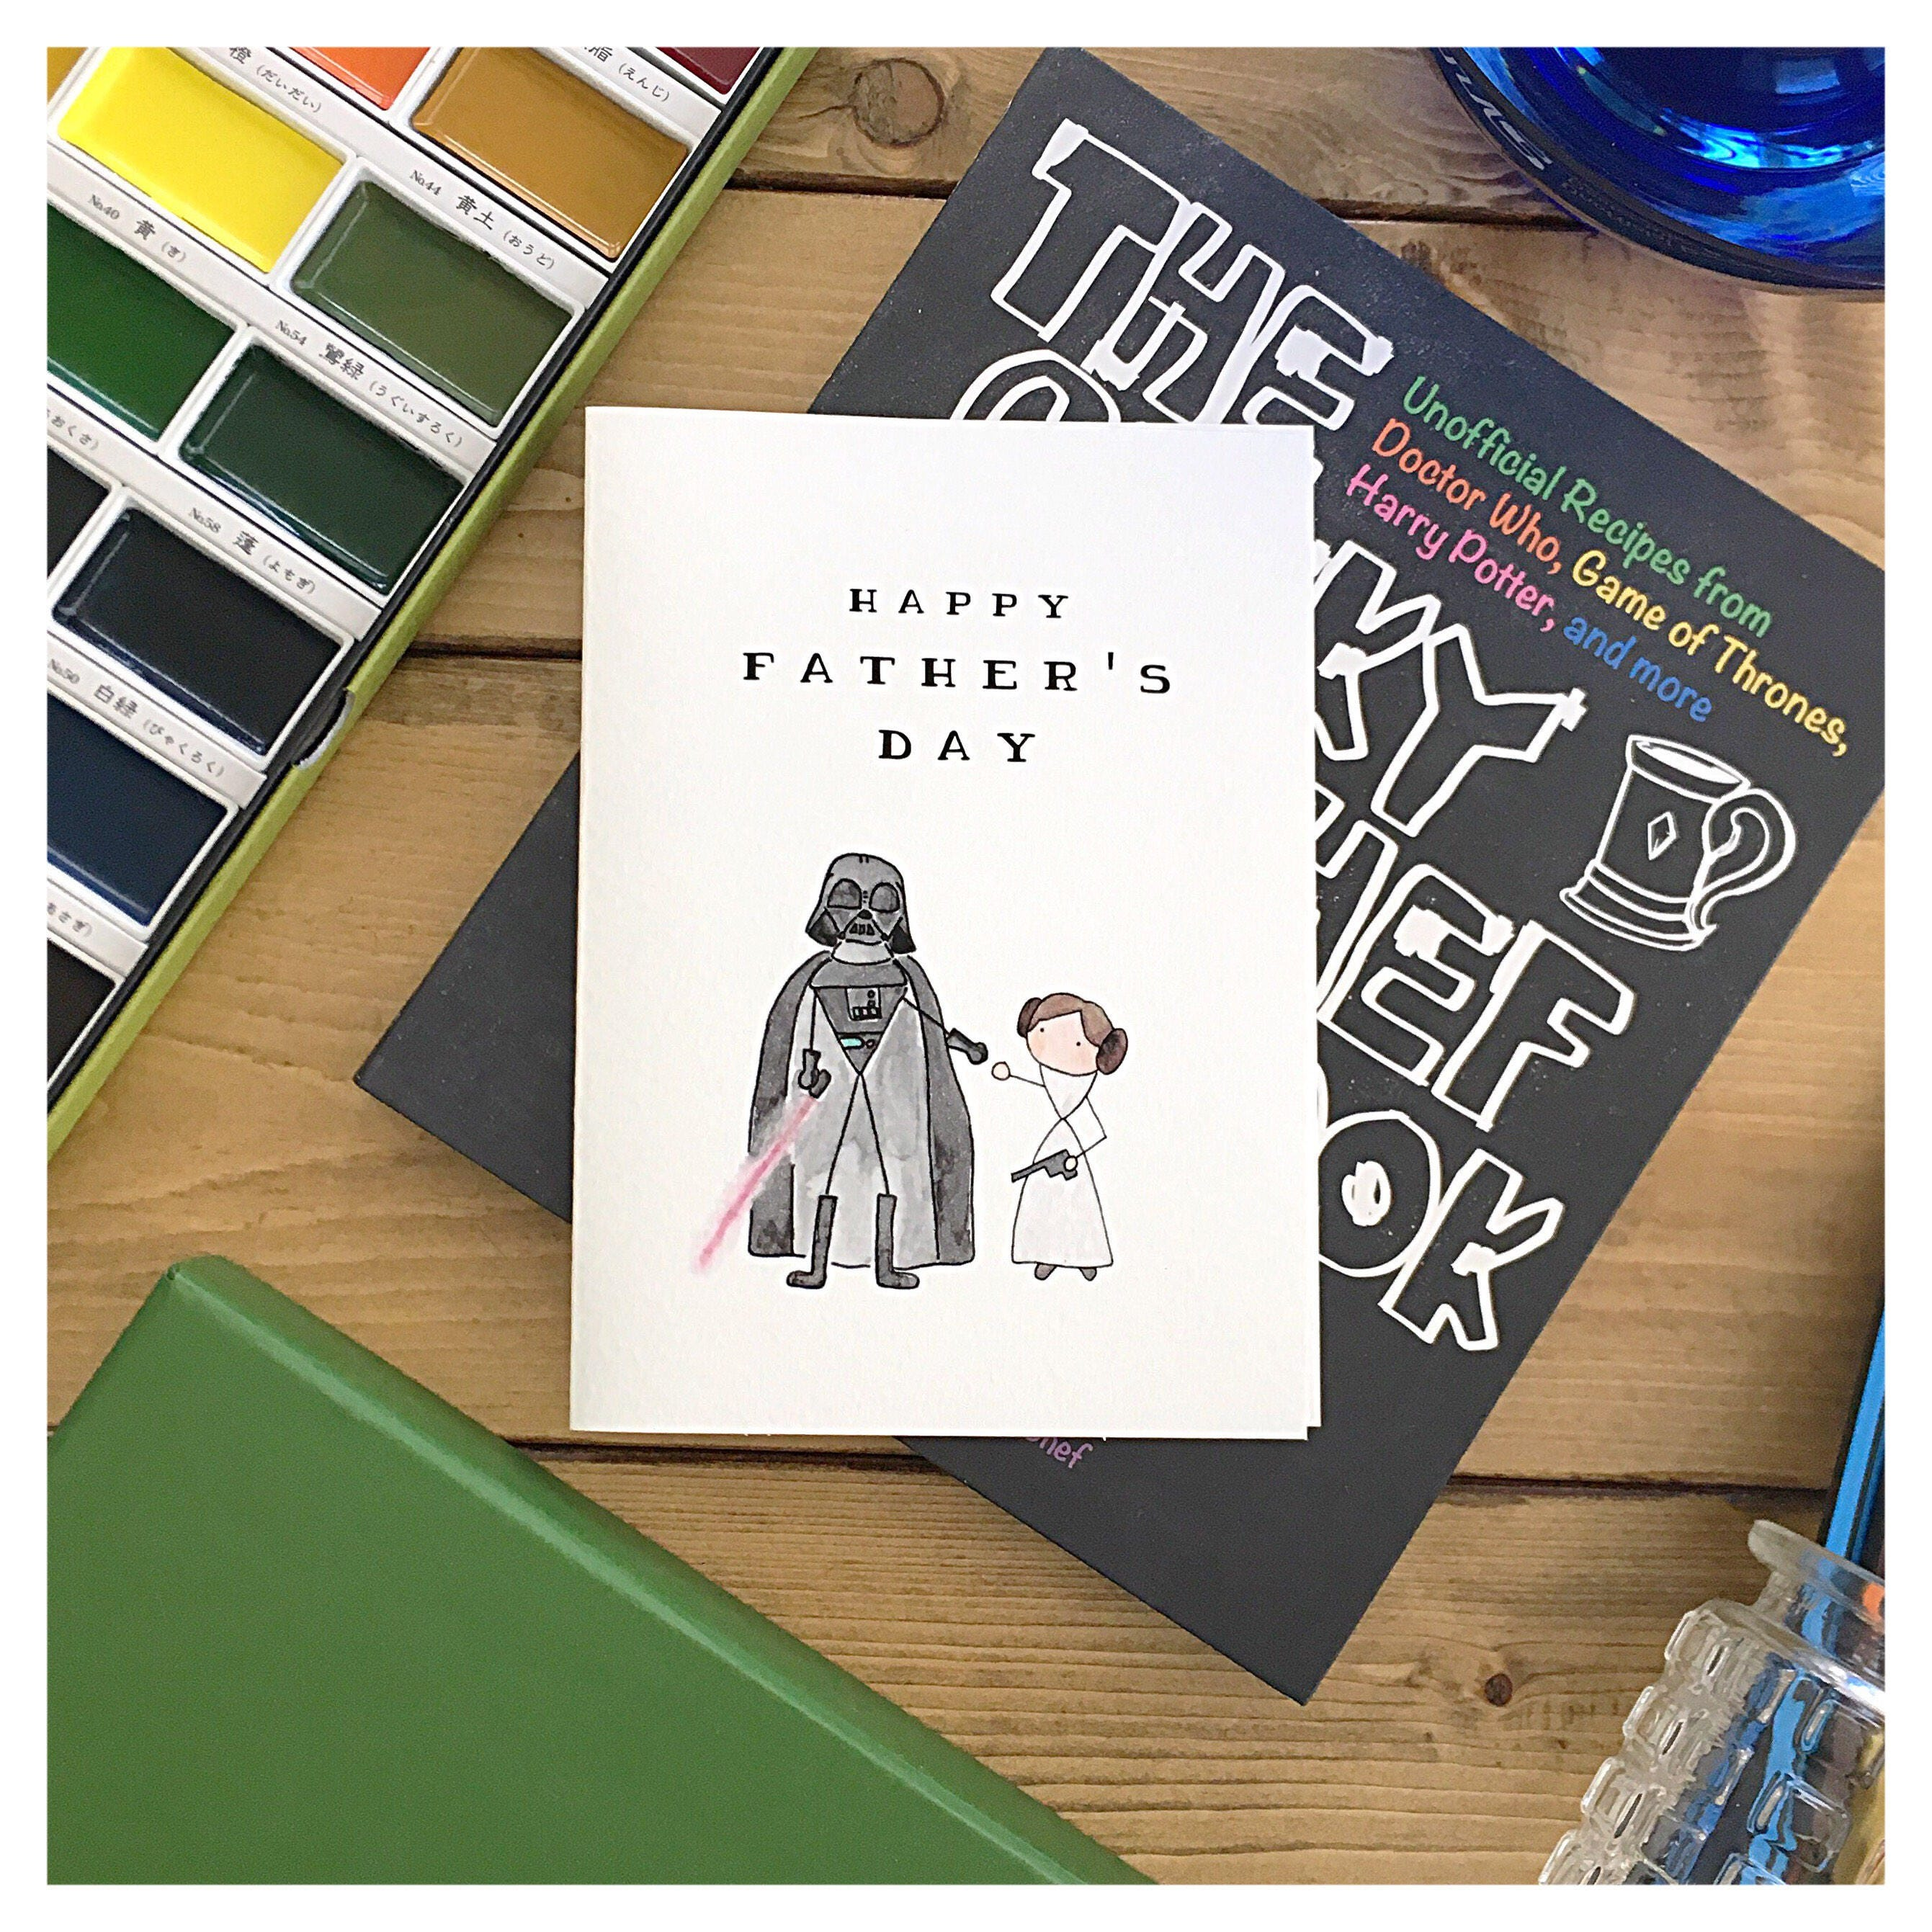 Starwars Fathers Day Card Star Wars Card Darth Vader Princess